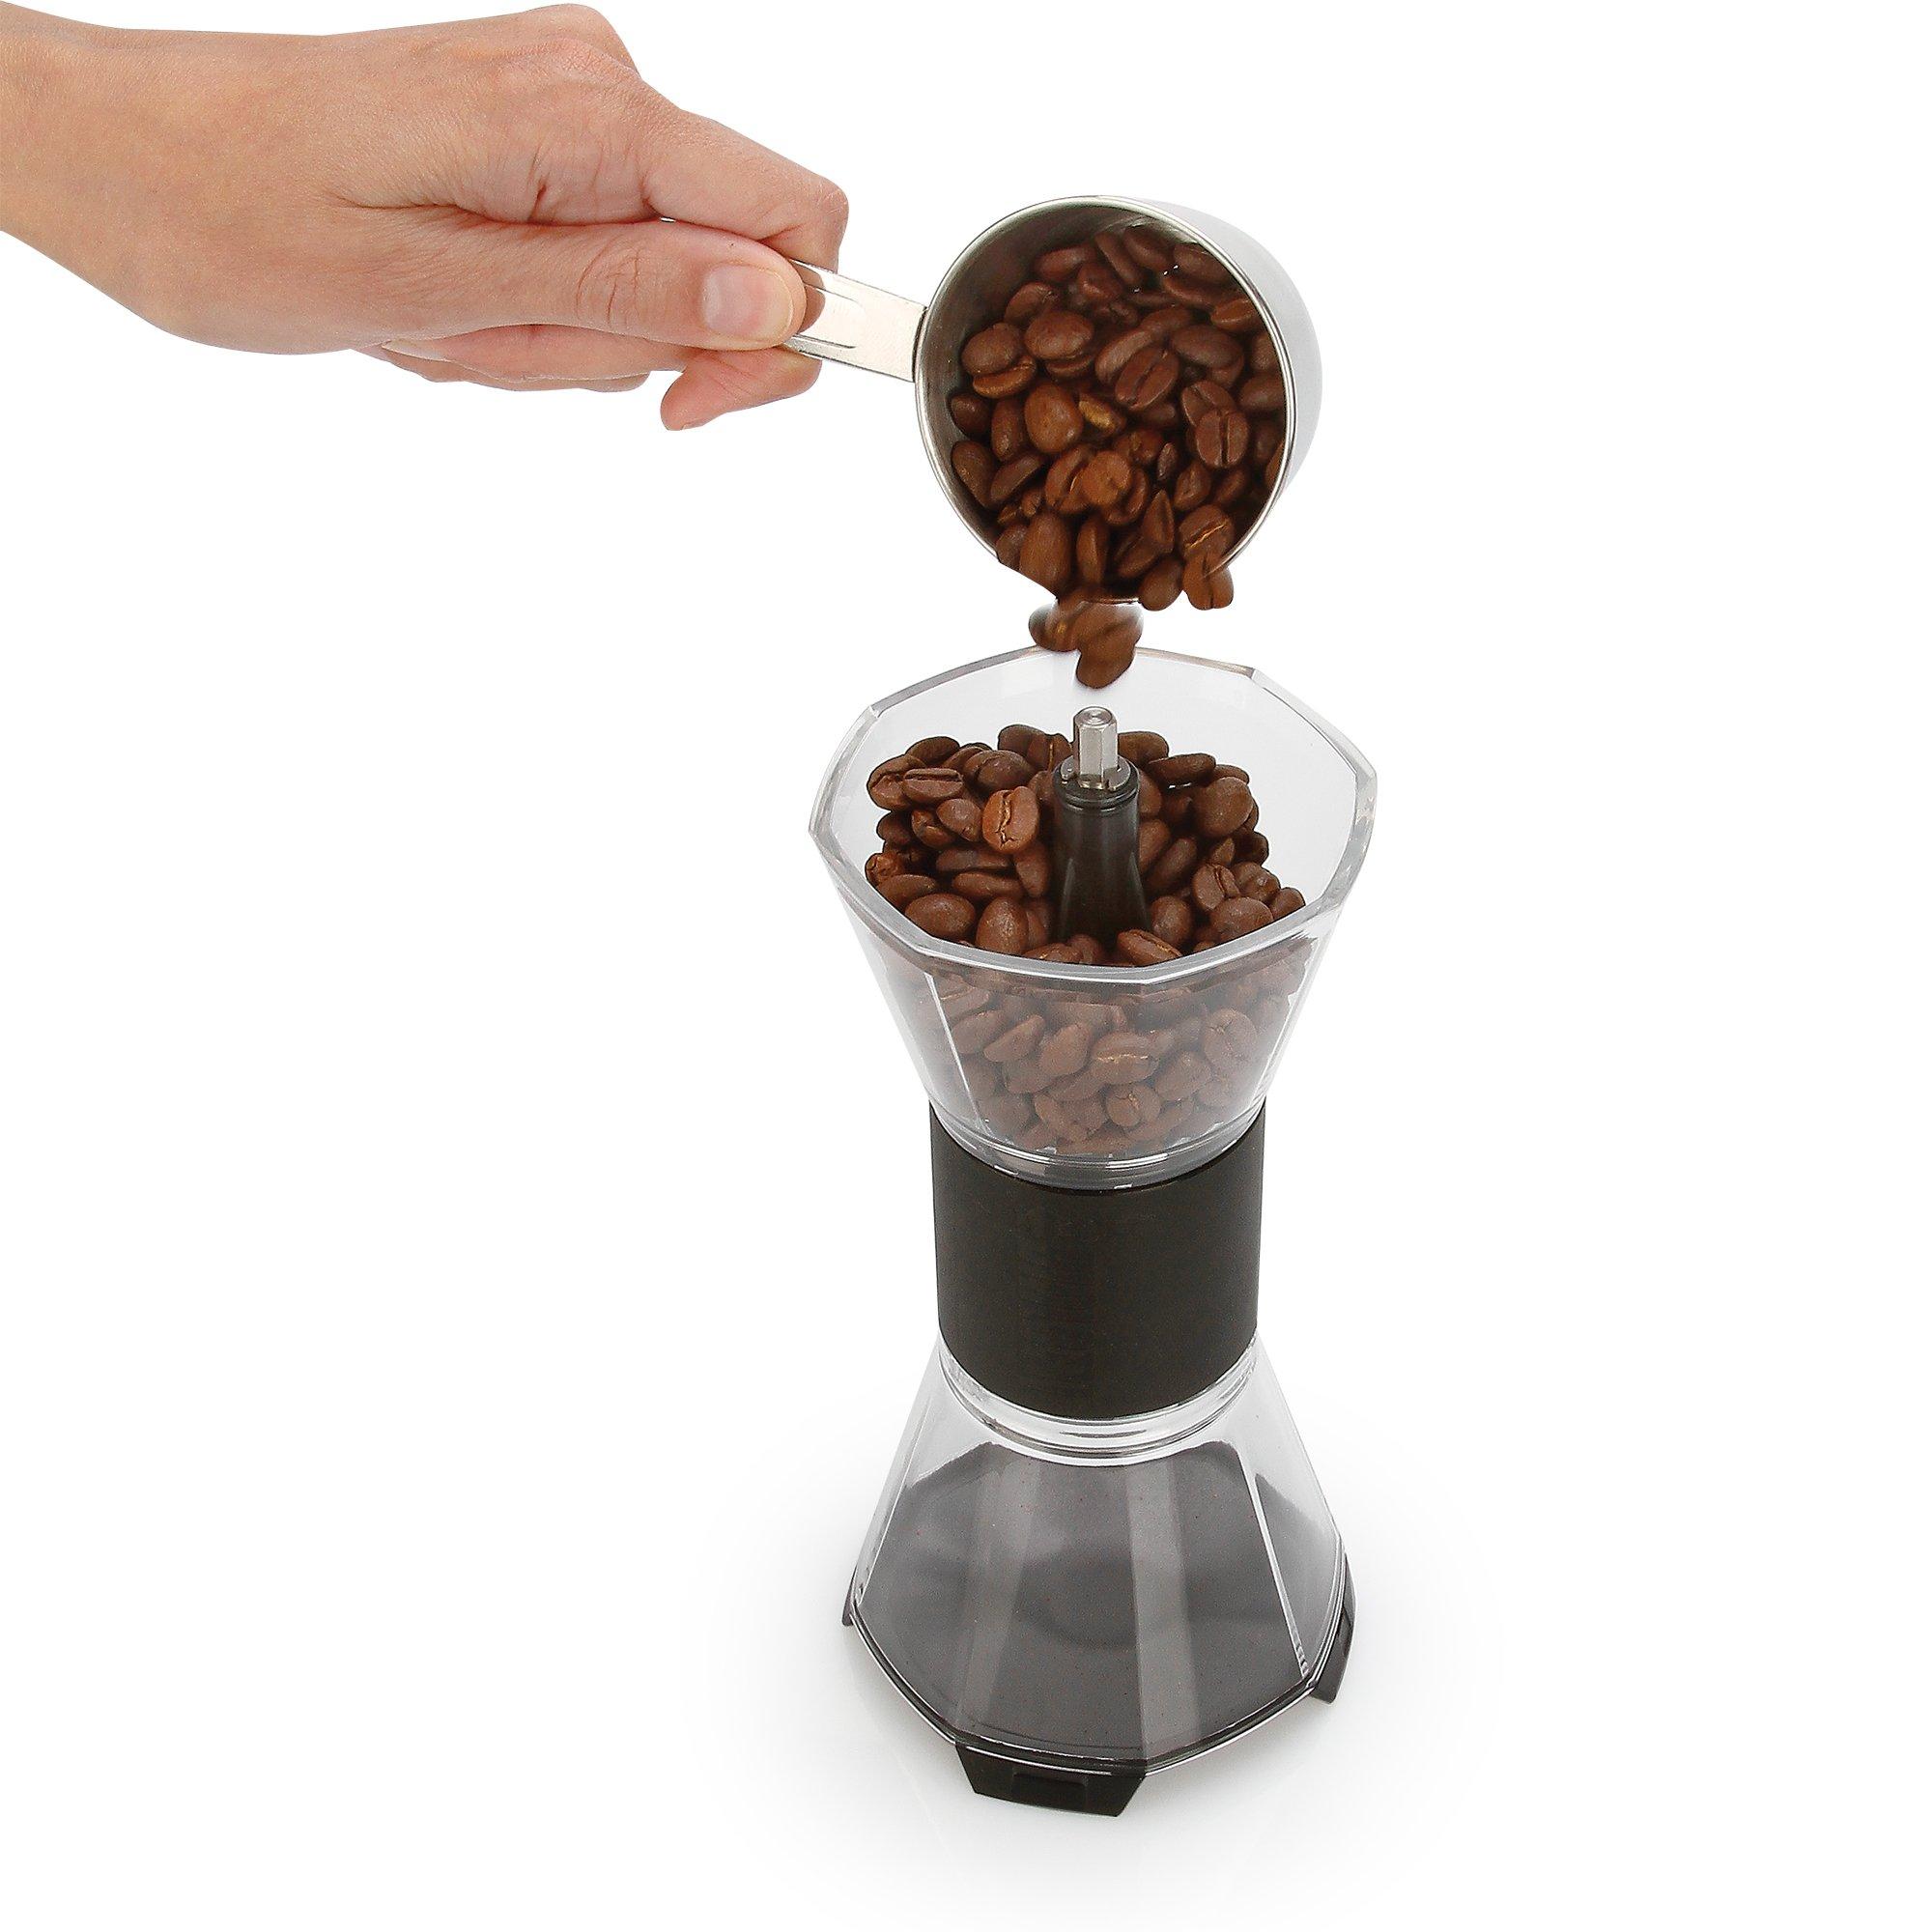 Bialetti Manual Coffee Grinder by Bialetti (Image #5)